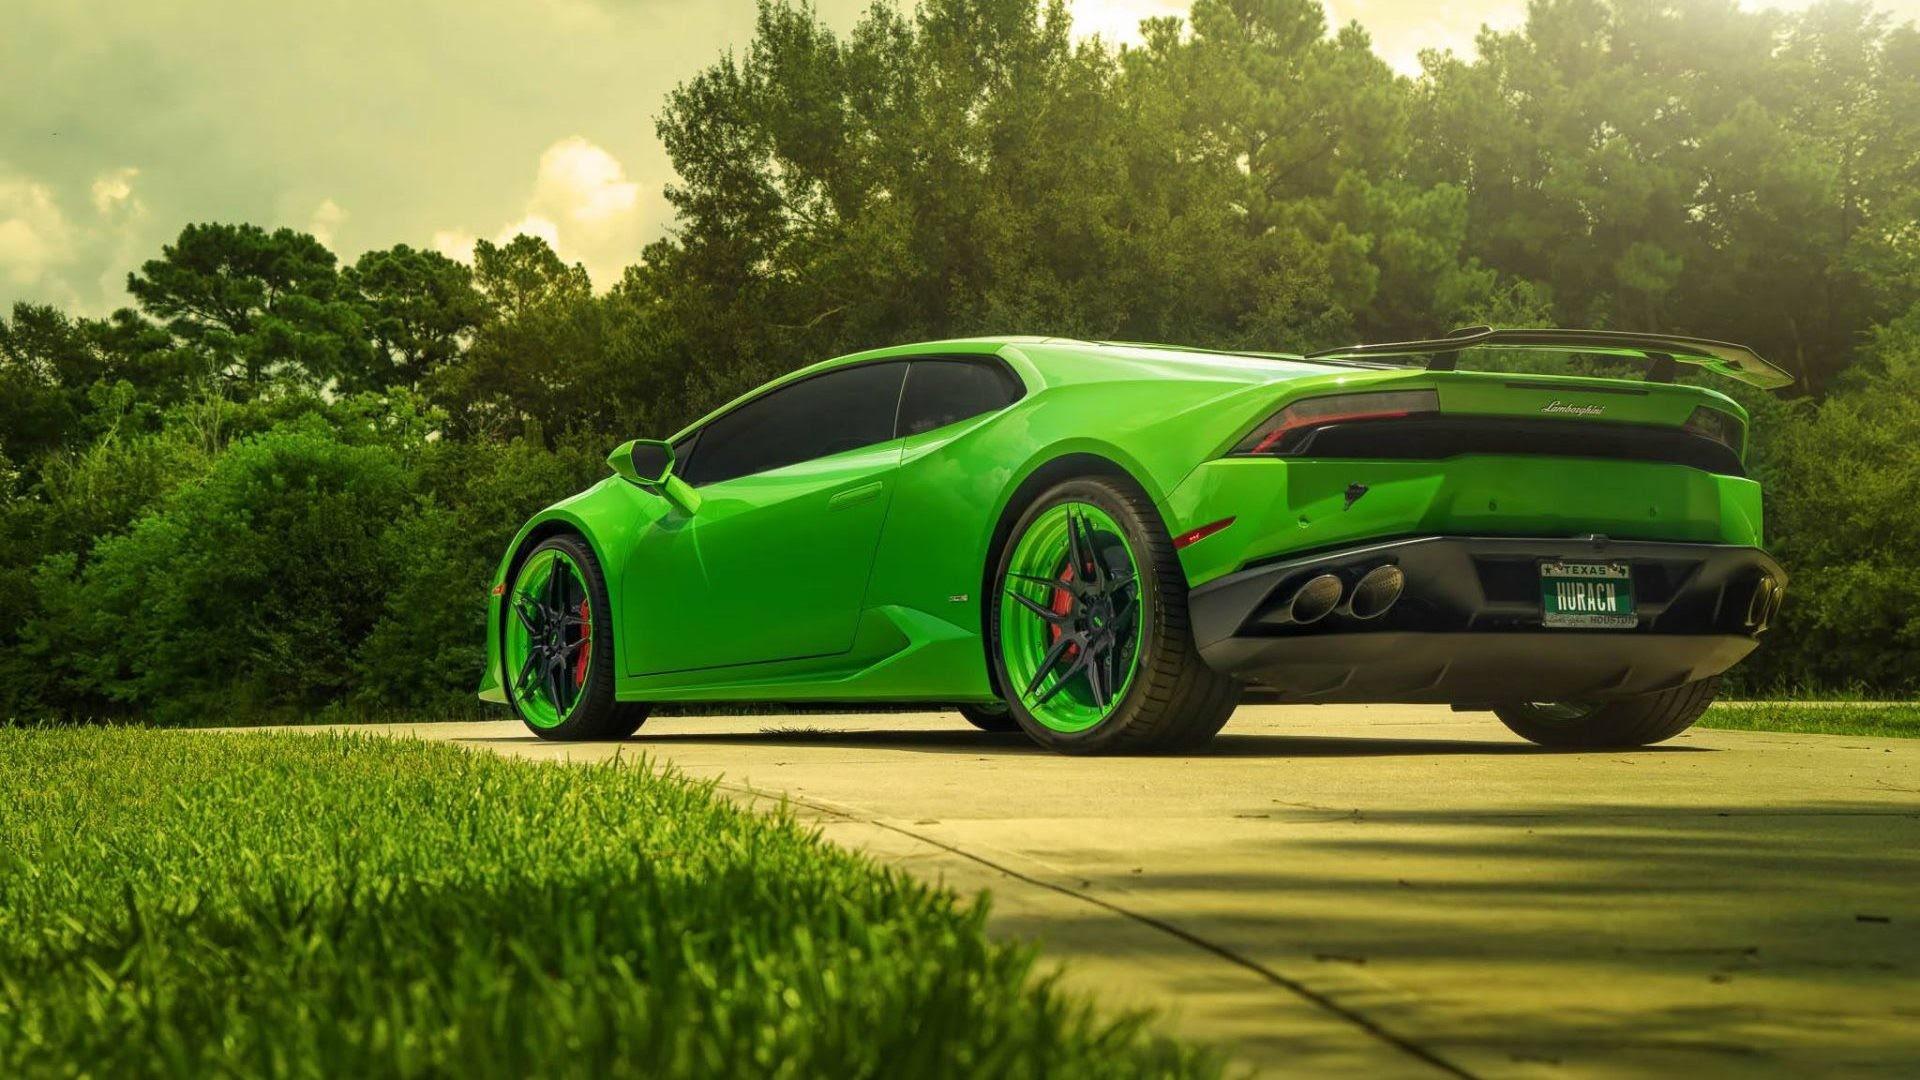 Lamborghini Cars Wallpaper 78+ images